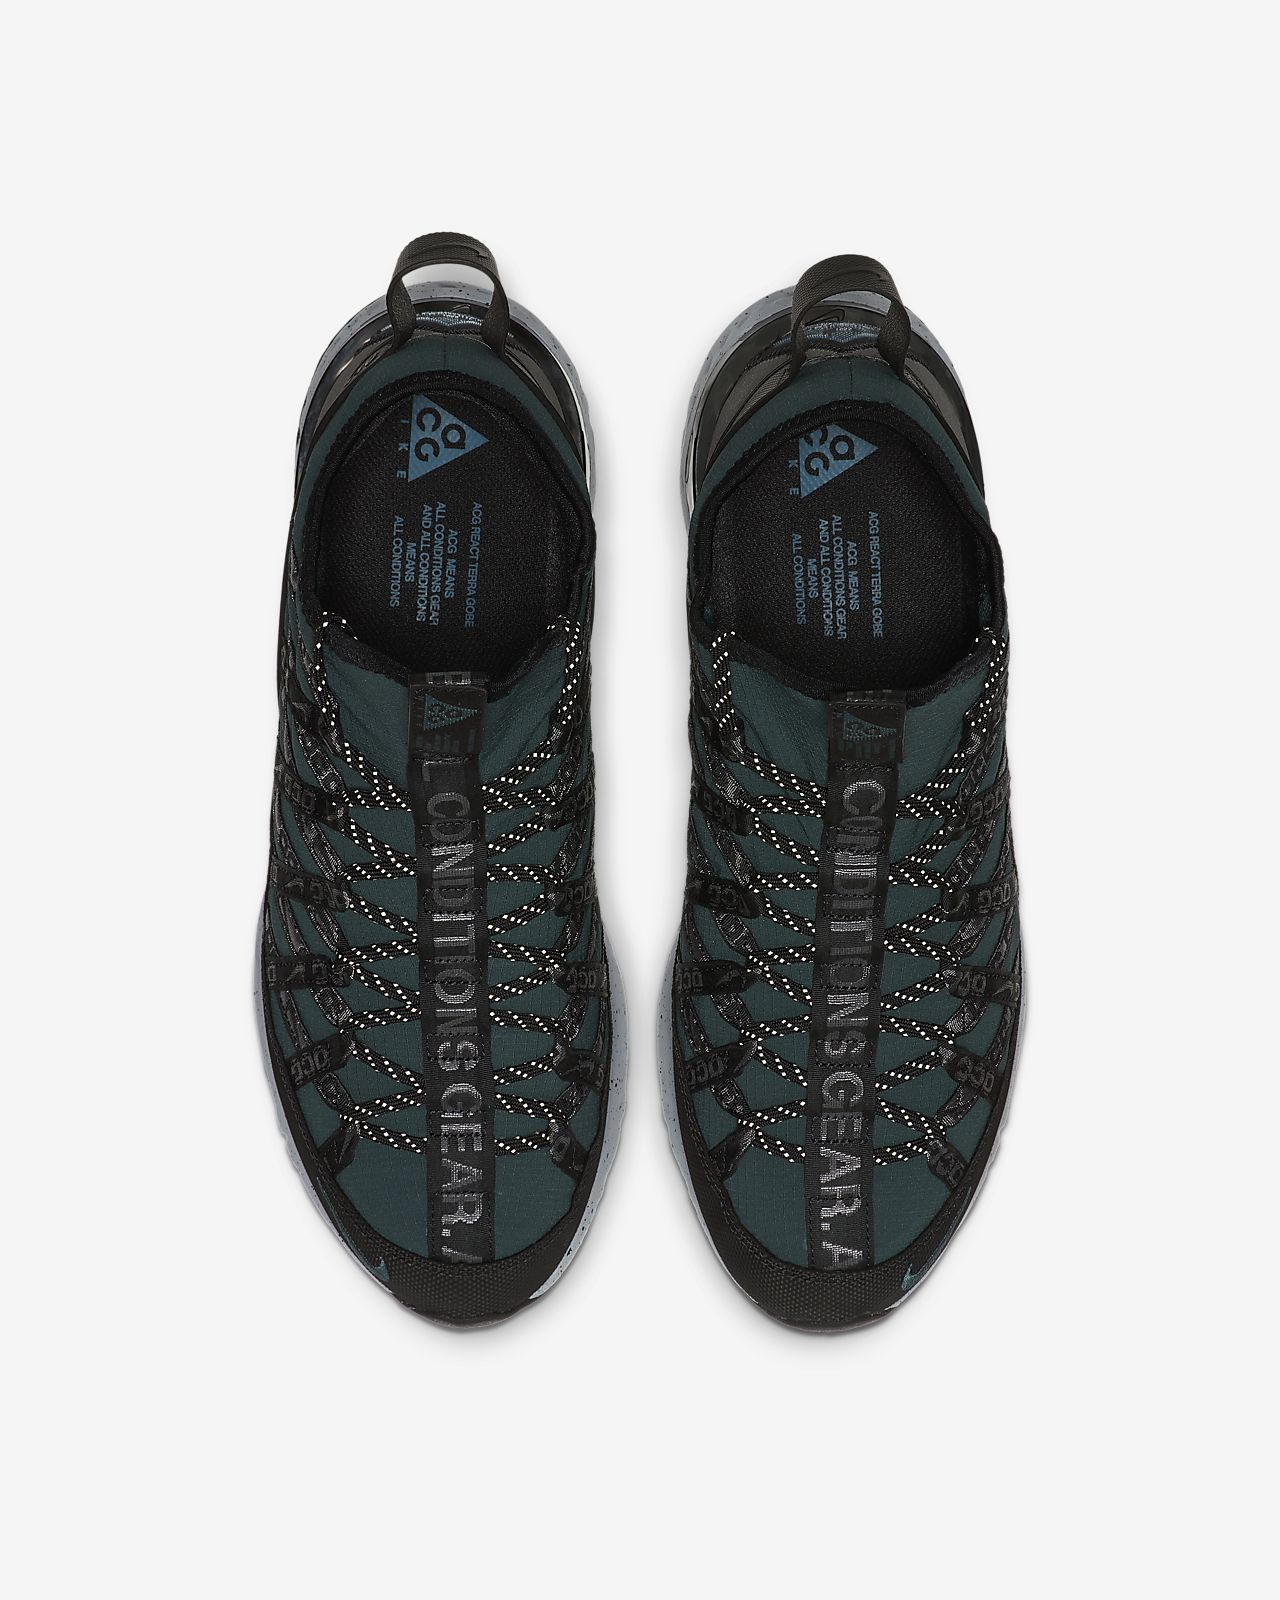 Terra 0n8nmw Shoe Nike Acg React Gobe Men's ukTOPZXi